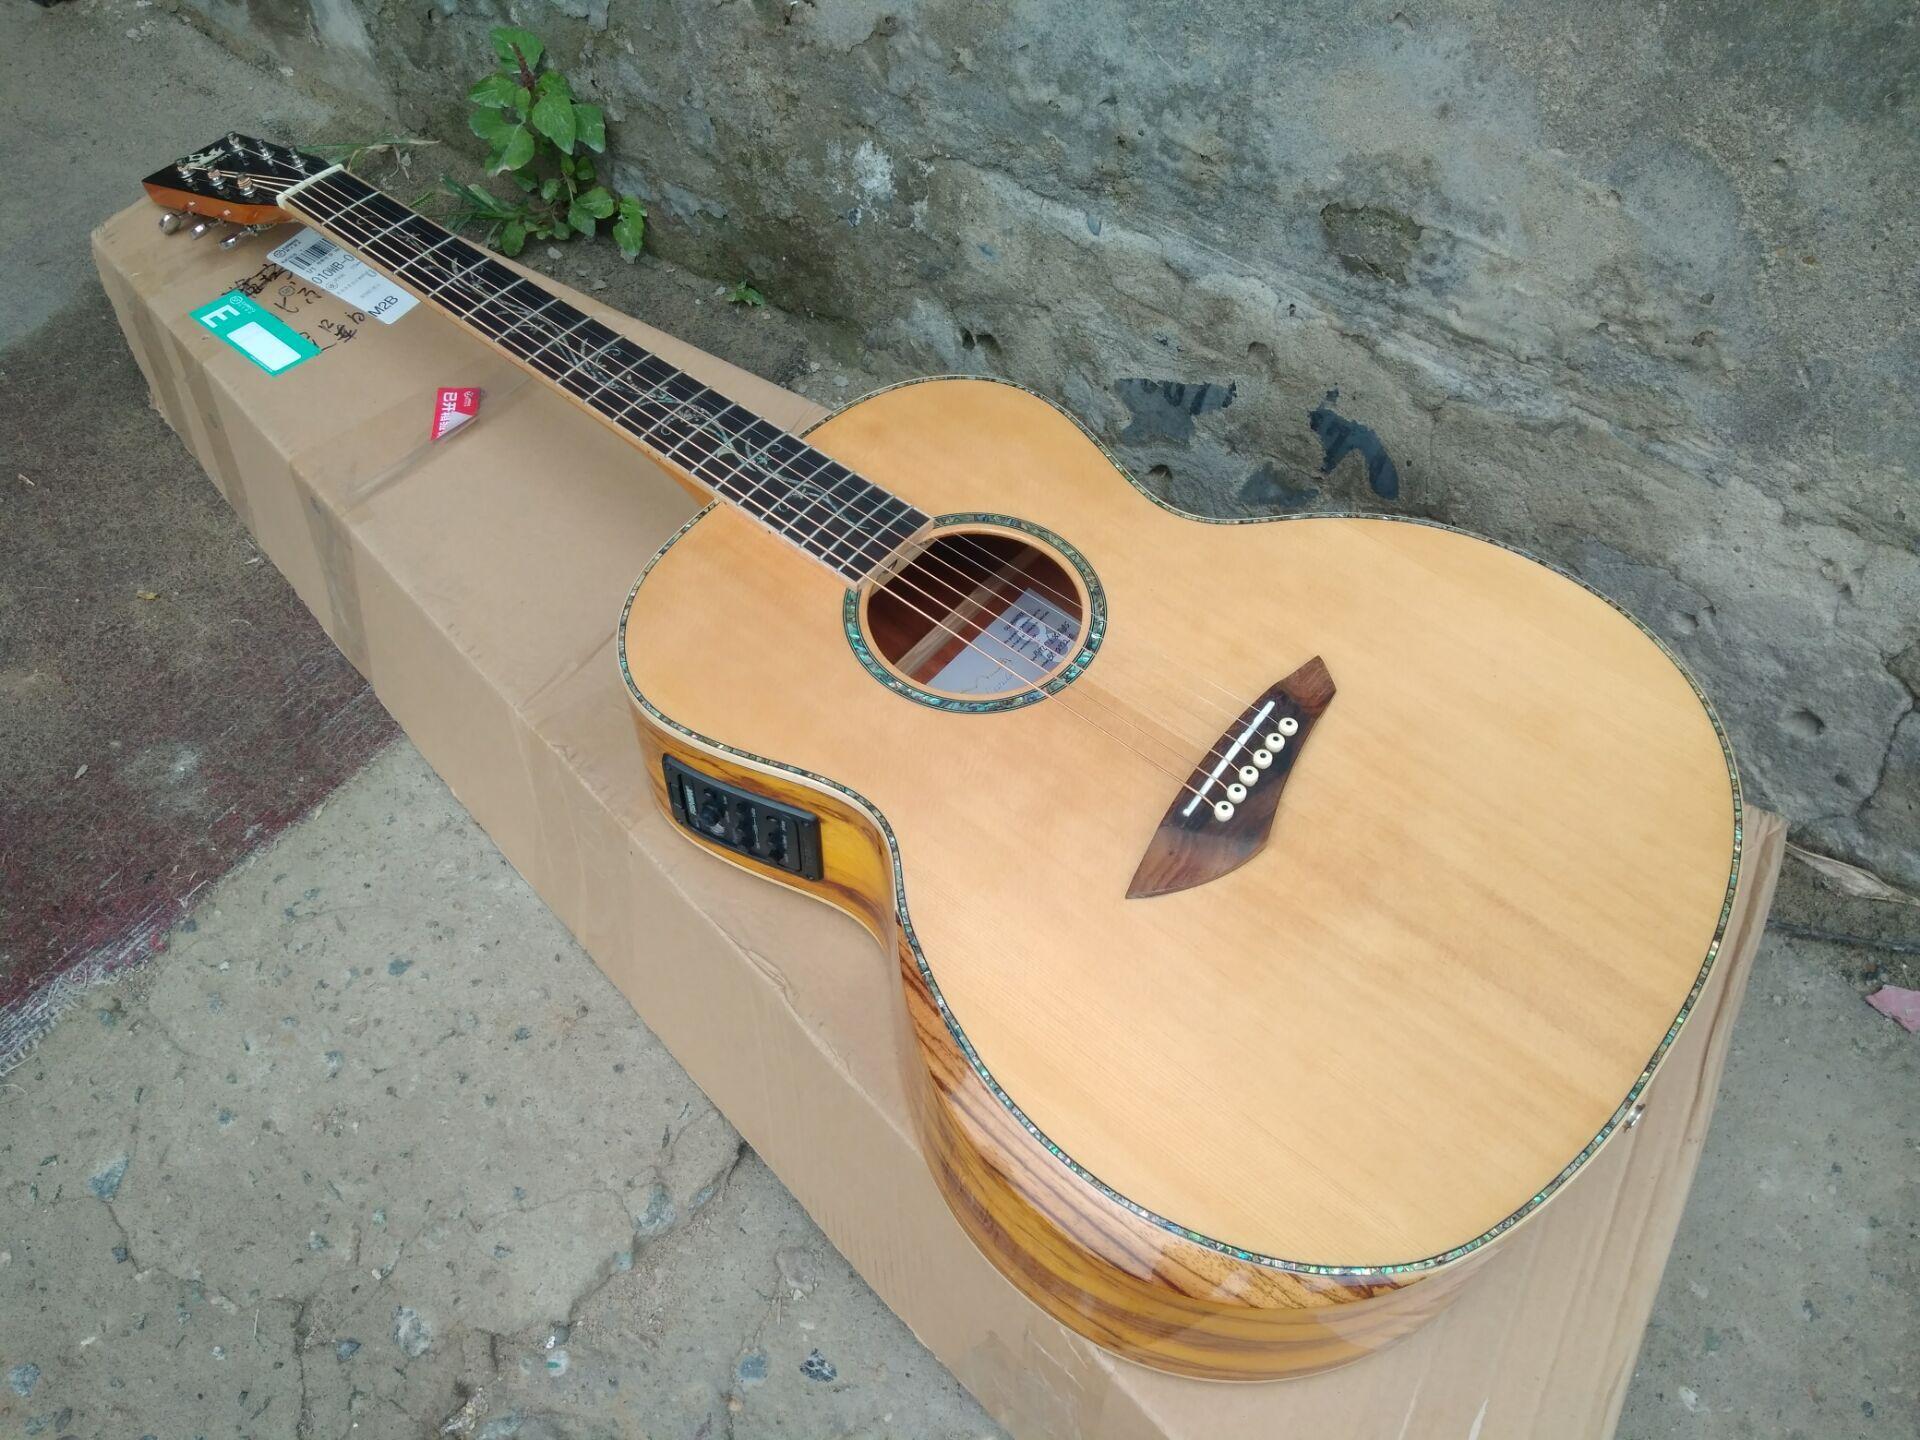 Byron-جيتار كهربائي صوتي ، خشب صلب ، شحن مجاني ، جودة AAA ، مخصص